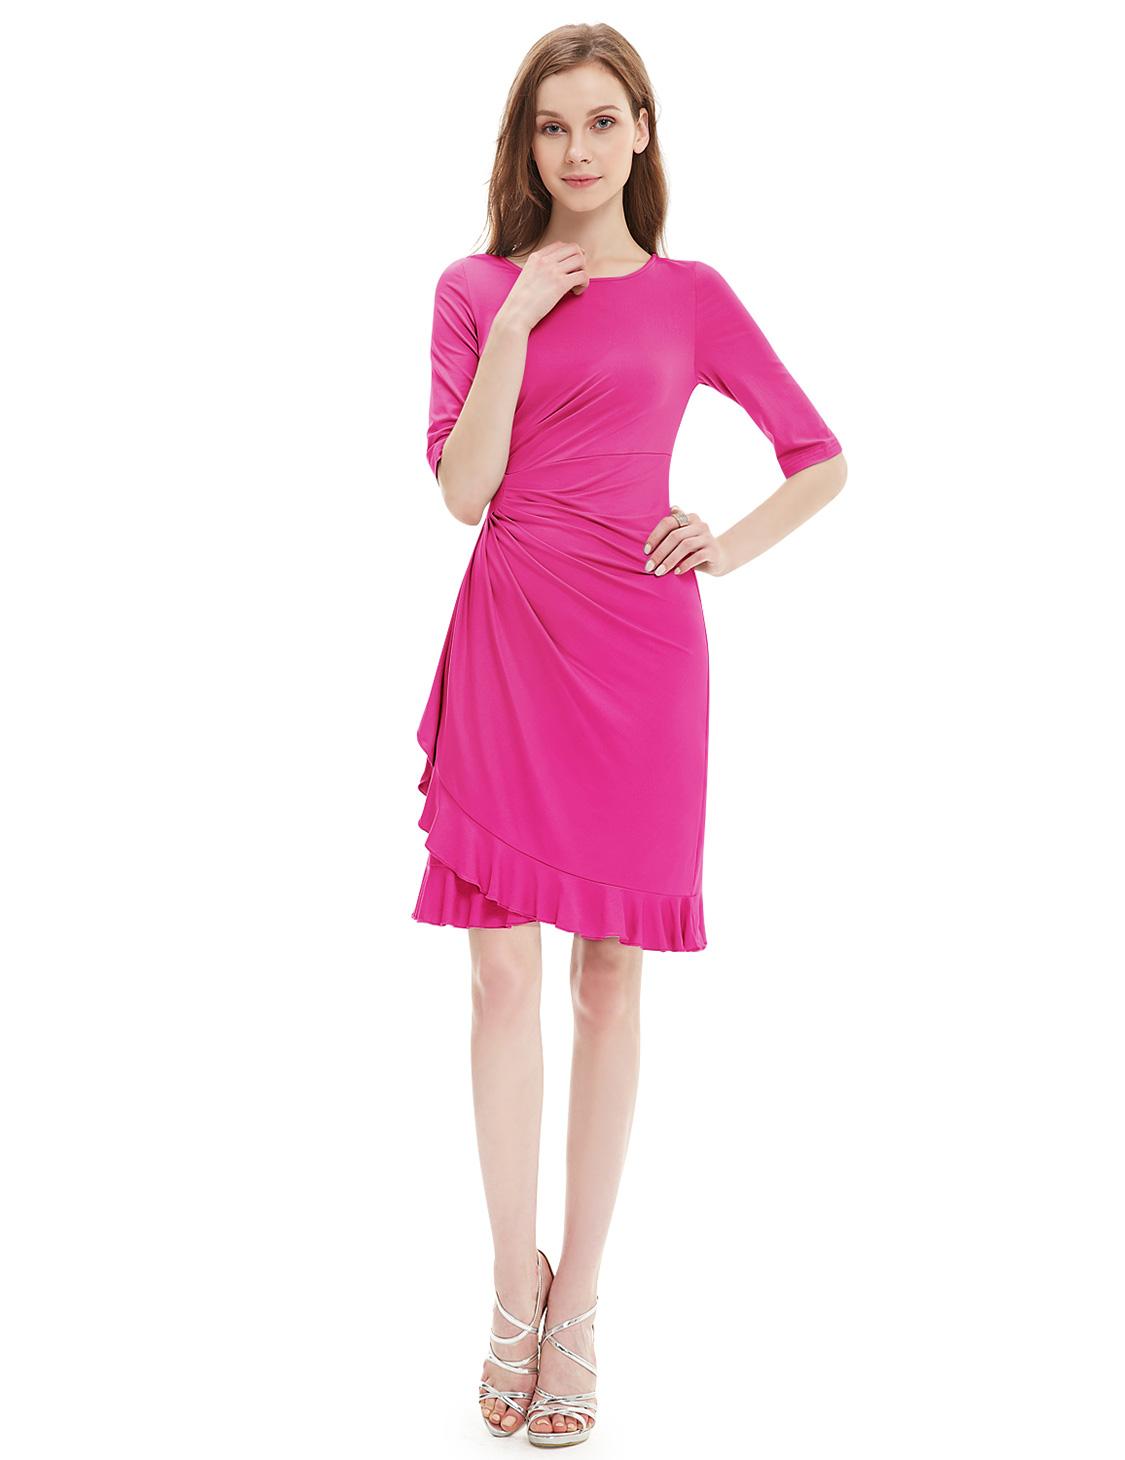 Ever-Pretty Short Formal Evening Dress Hot Pink Size 12 Vovktail ...